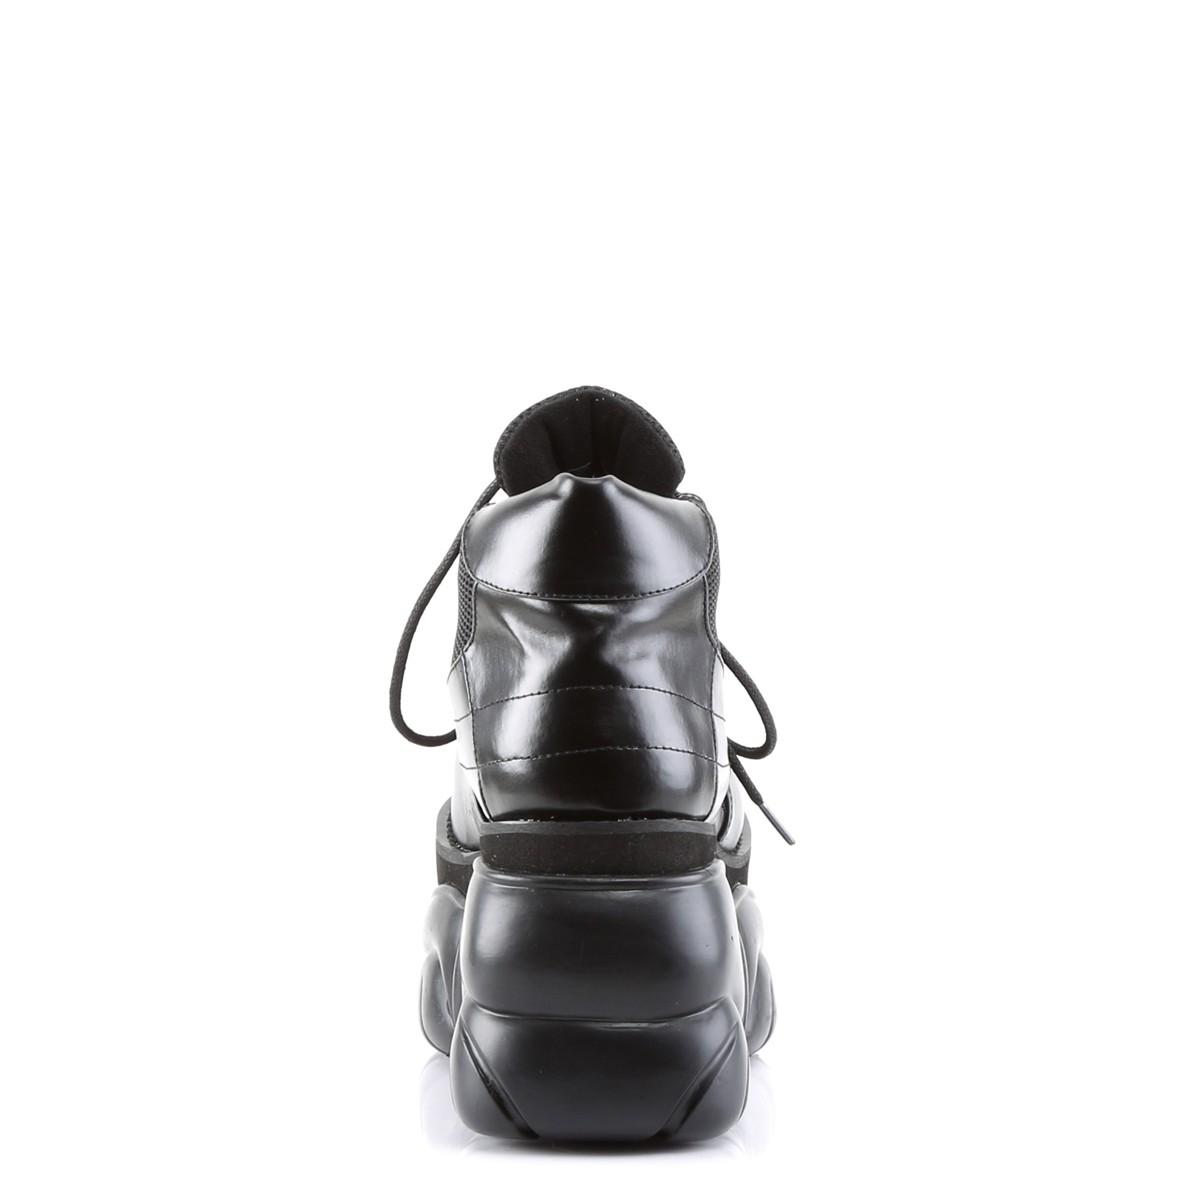 Bota Boxer 01 Cano Curto - Demonia (encomenda)